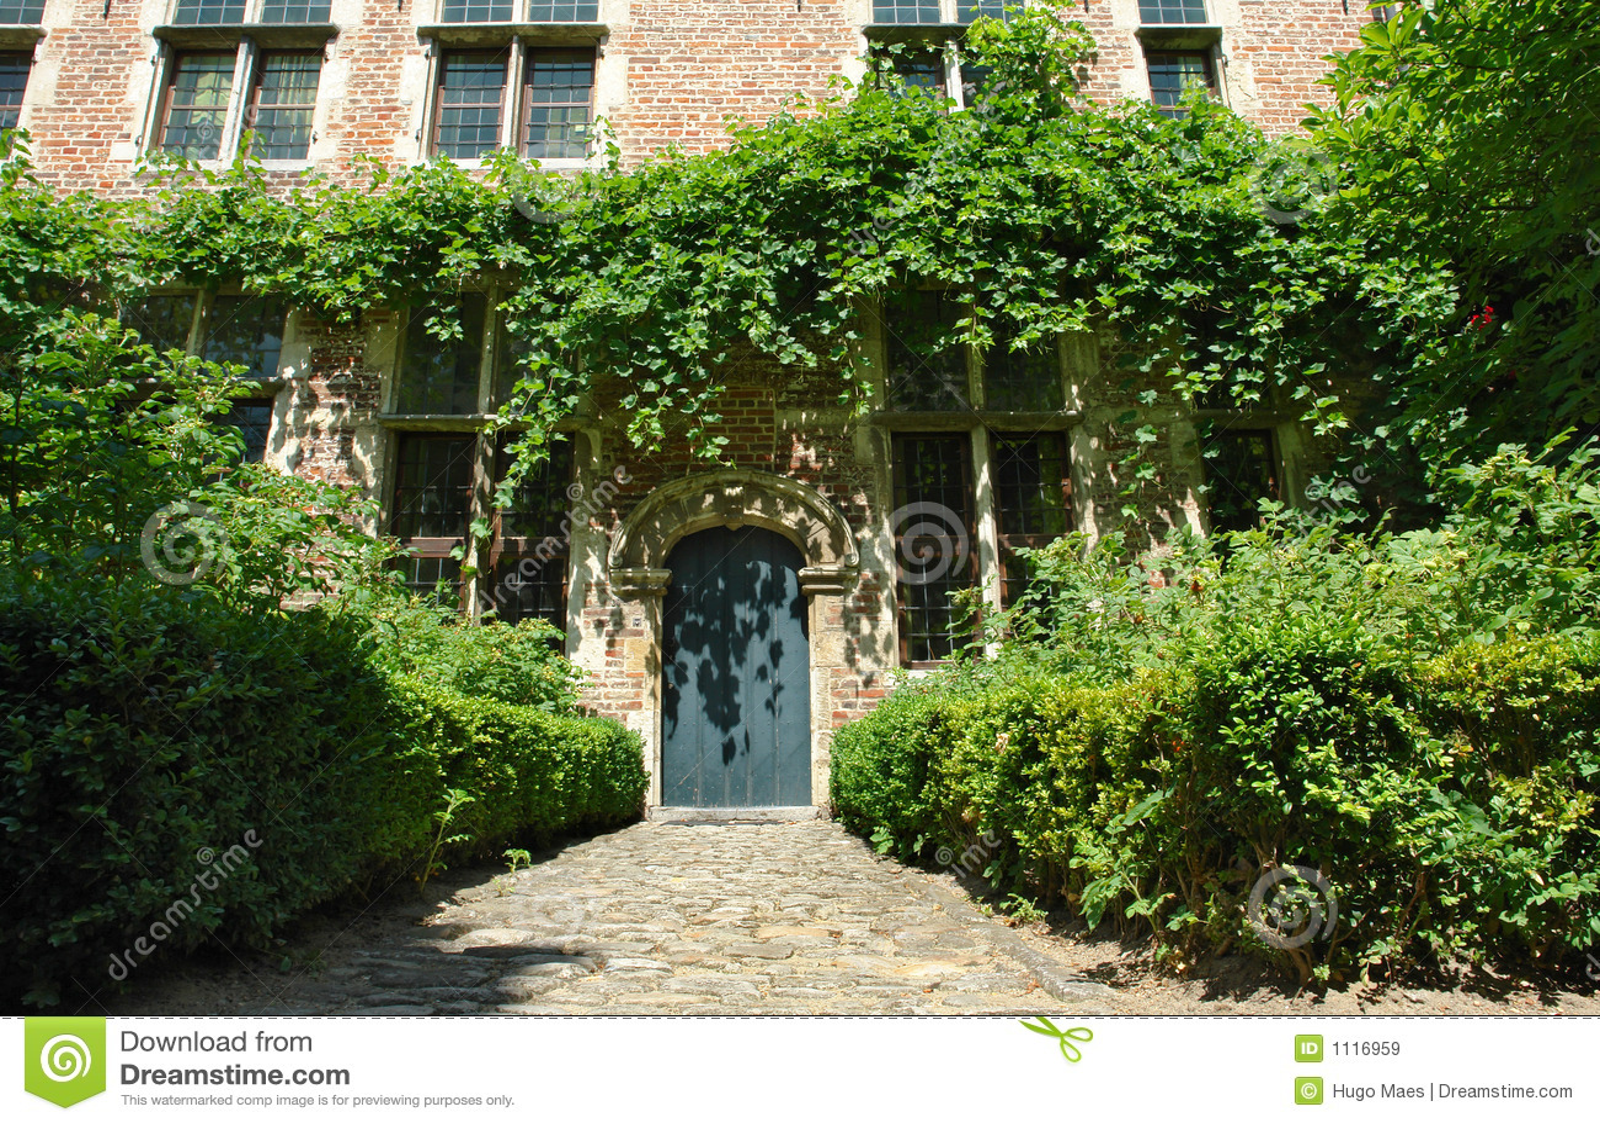 Download Medieval Flemish House Facade Stock Image - Image of door, green: 1116959